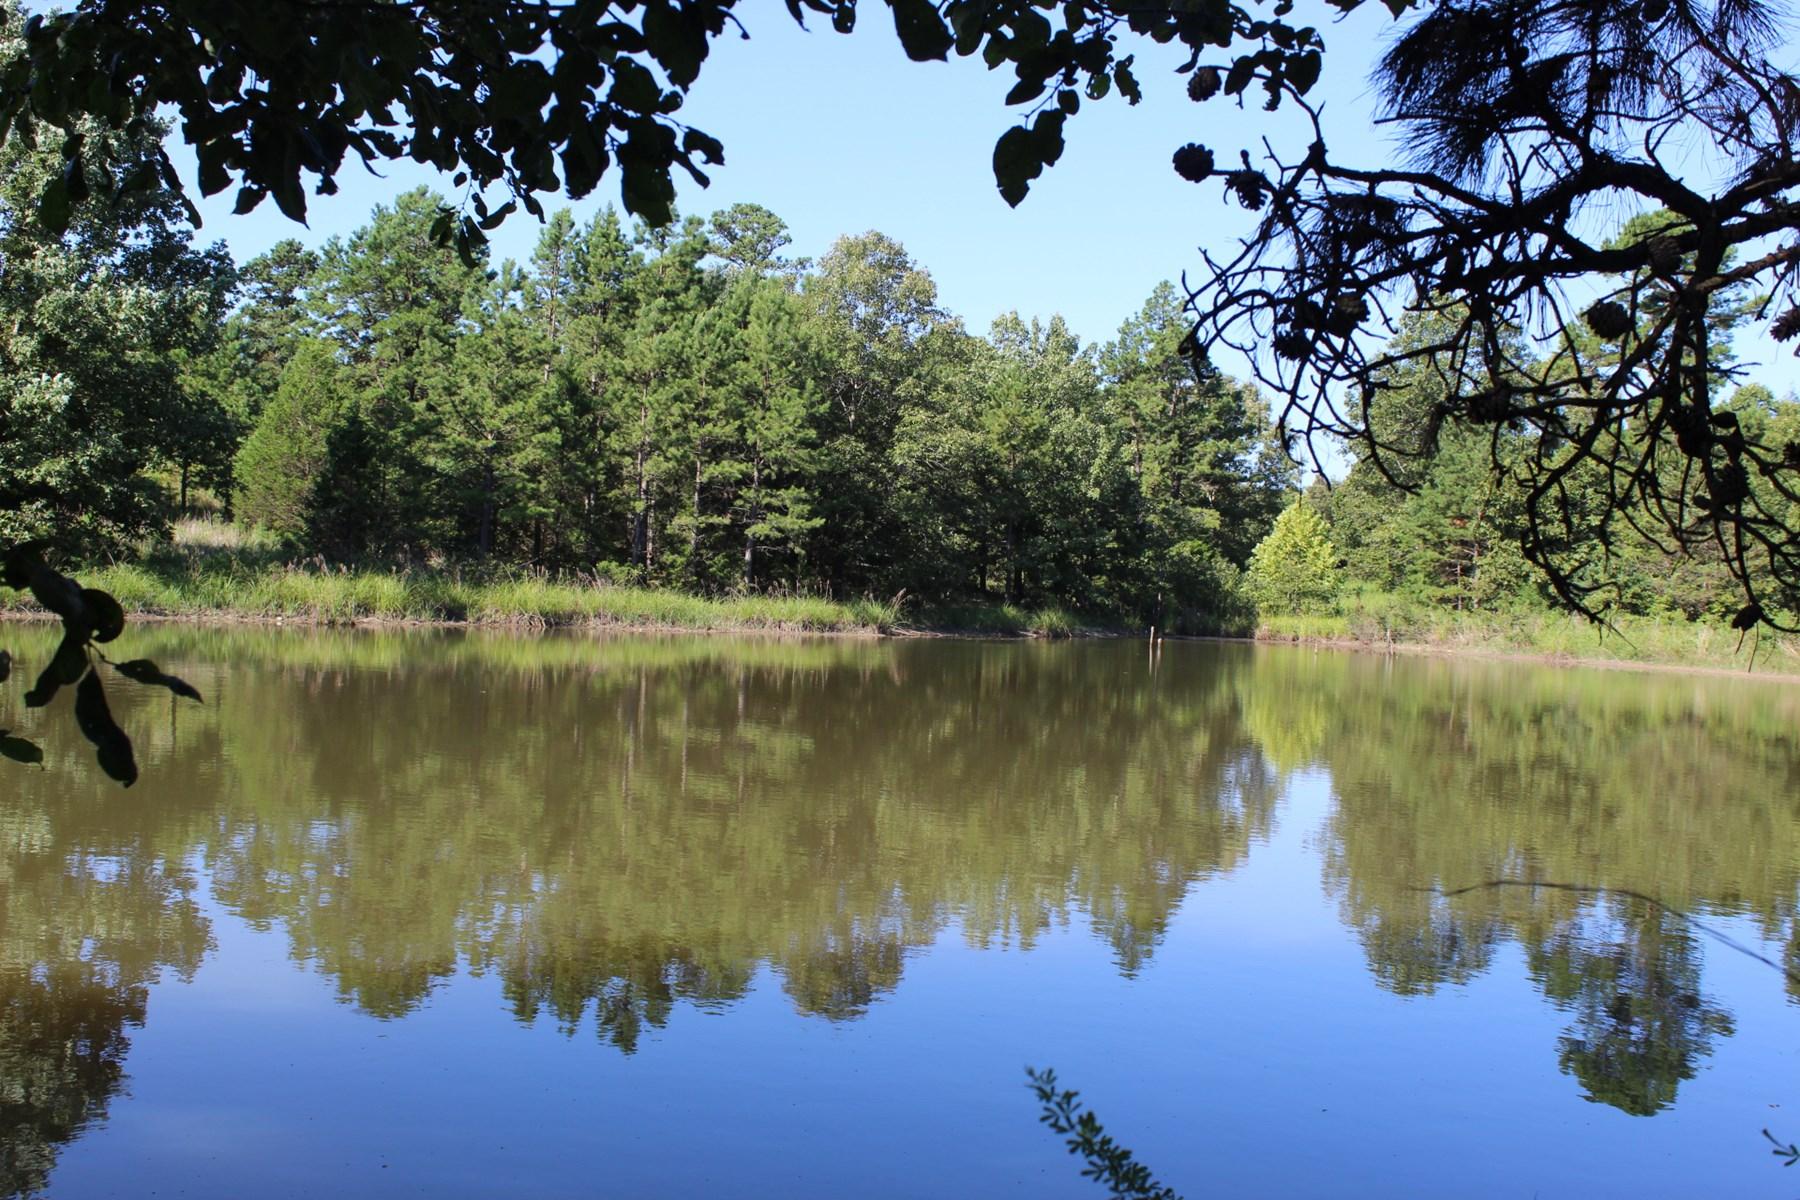 Acreage for sale in Izard County Arkansas